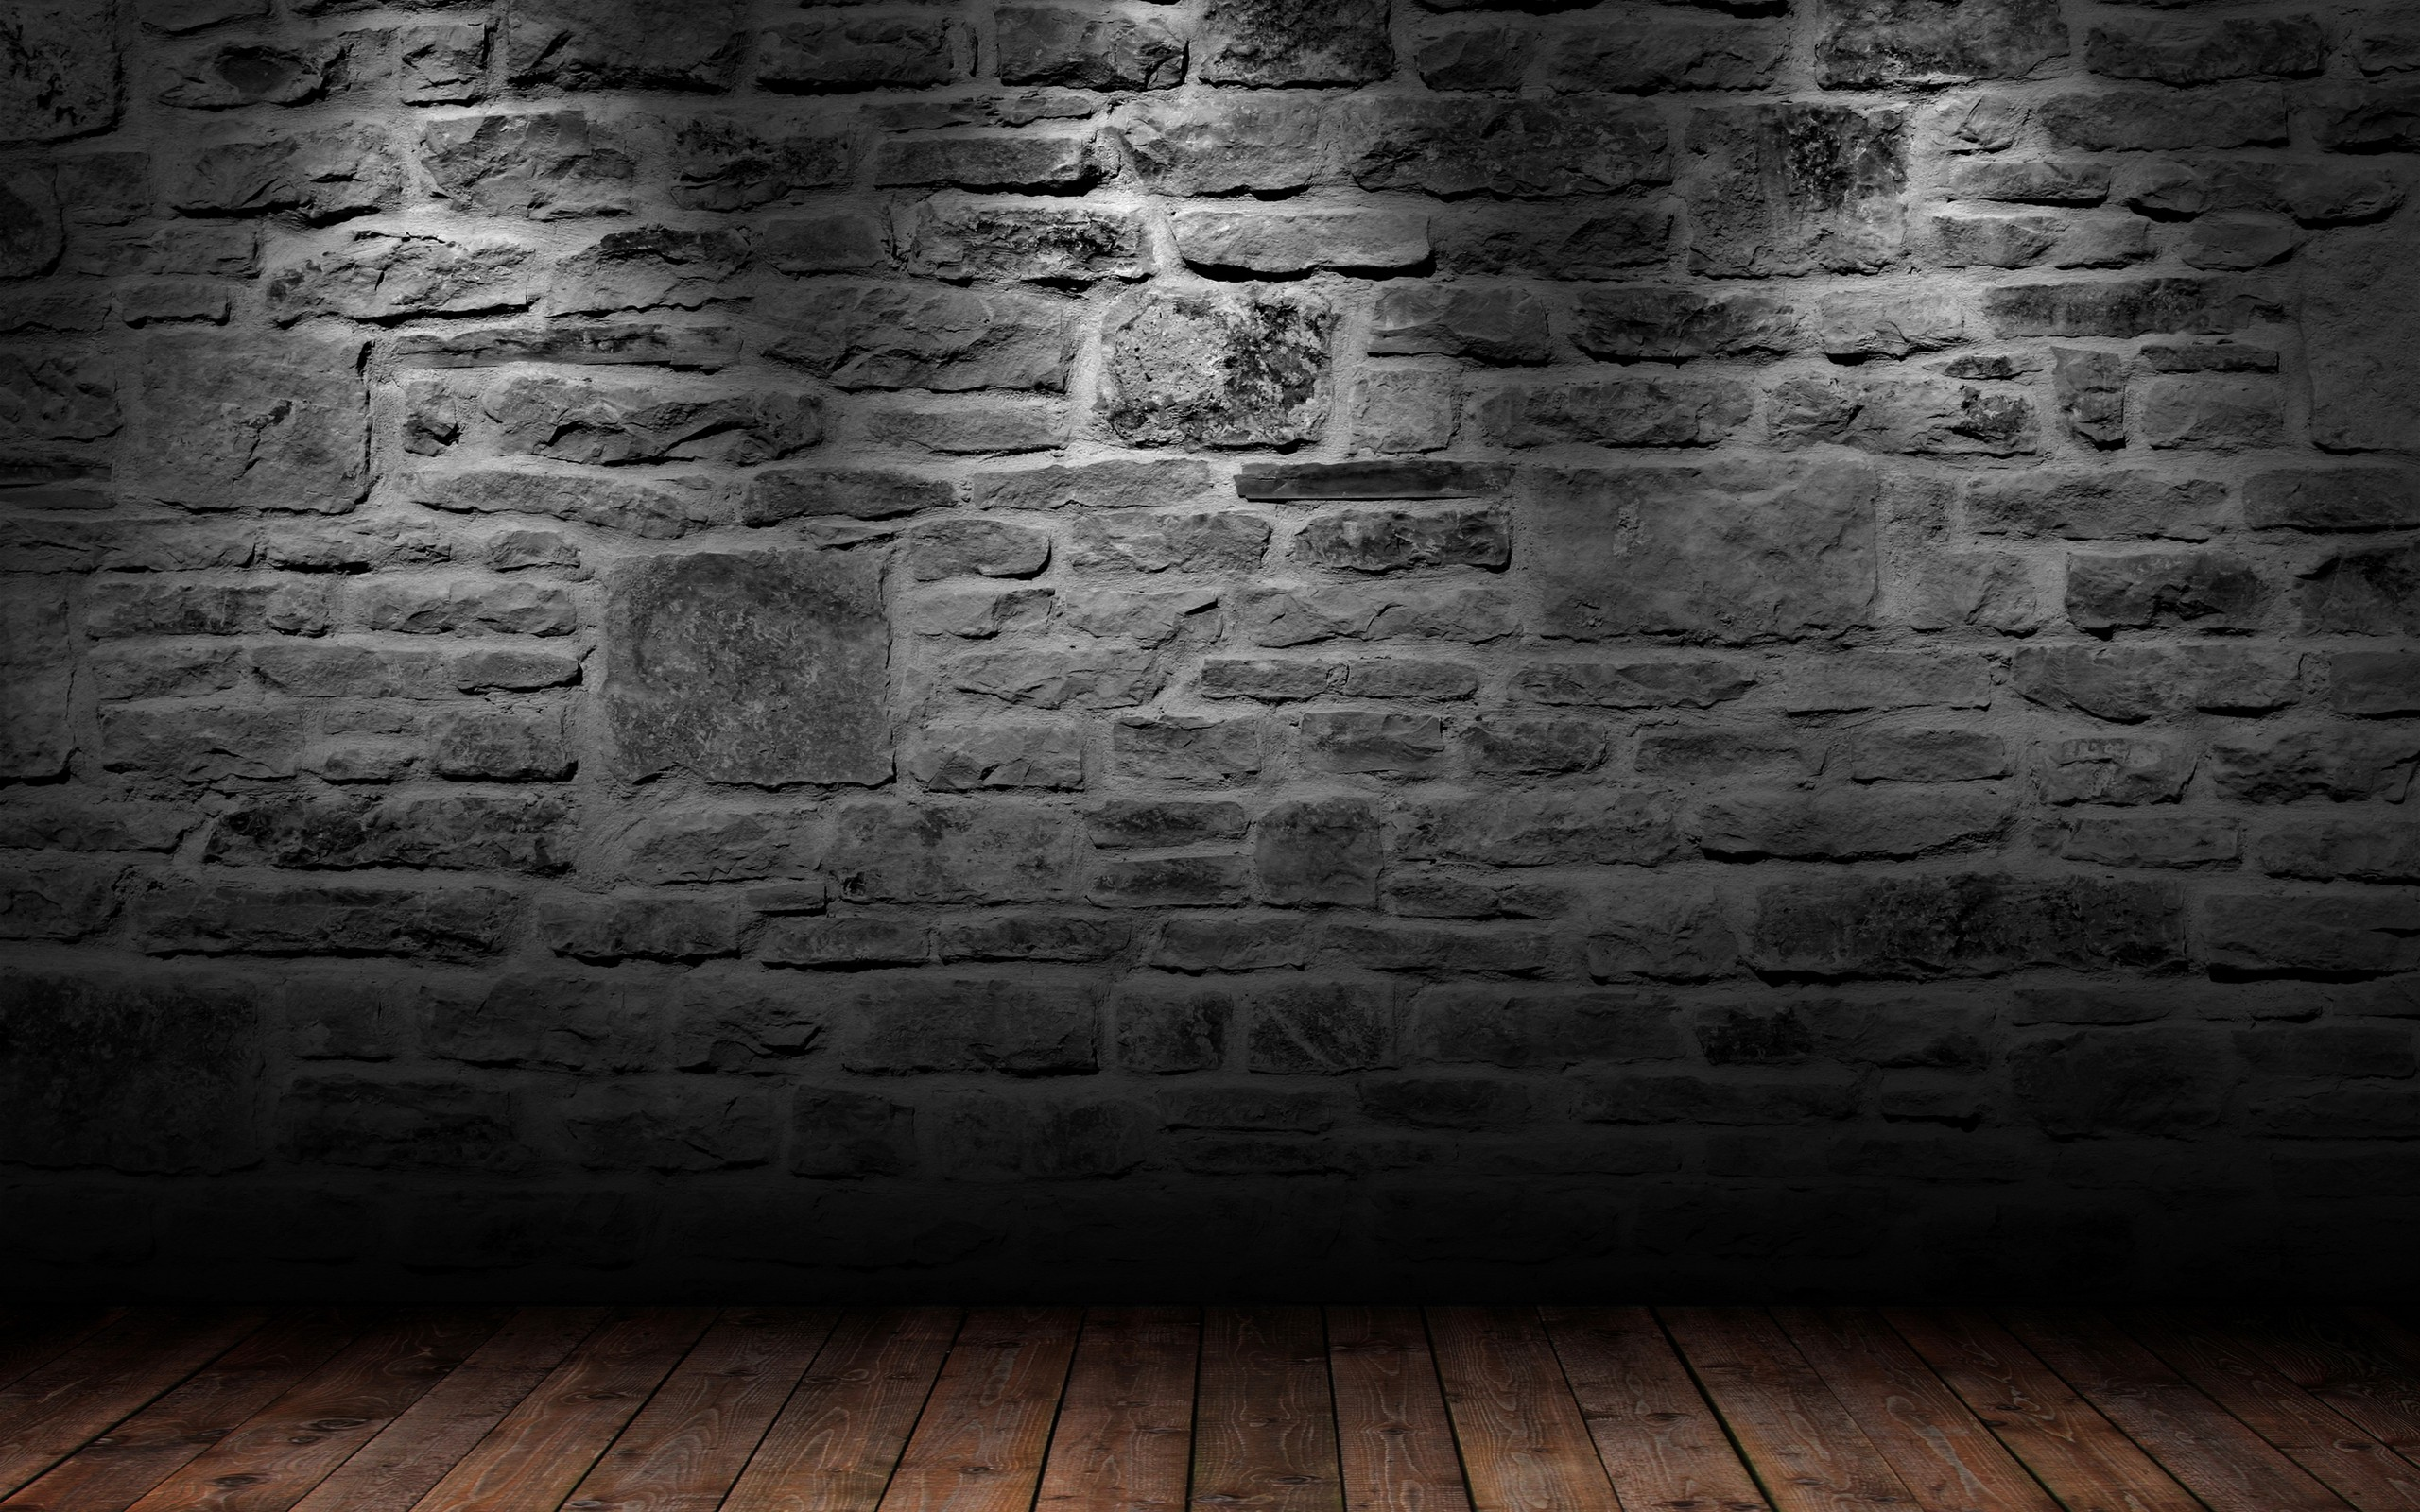 3d floor wallpaper wallpapersafari for 3d wallpapers for home walls in nigeria